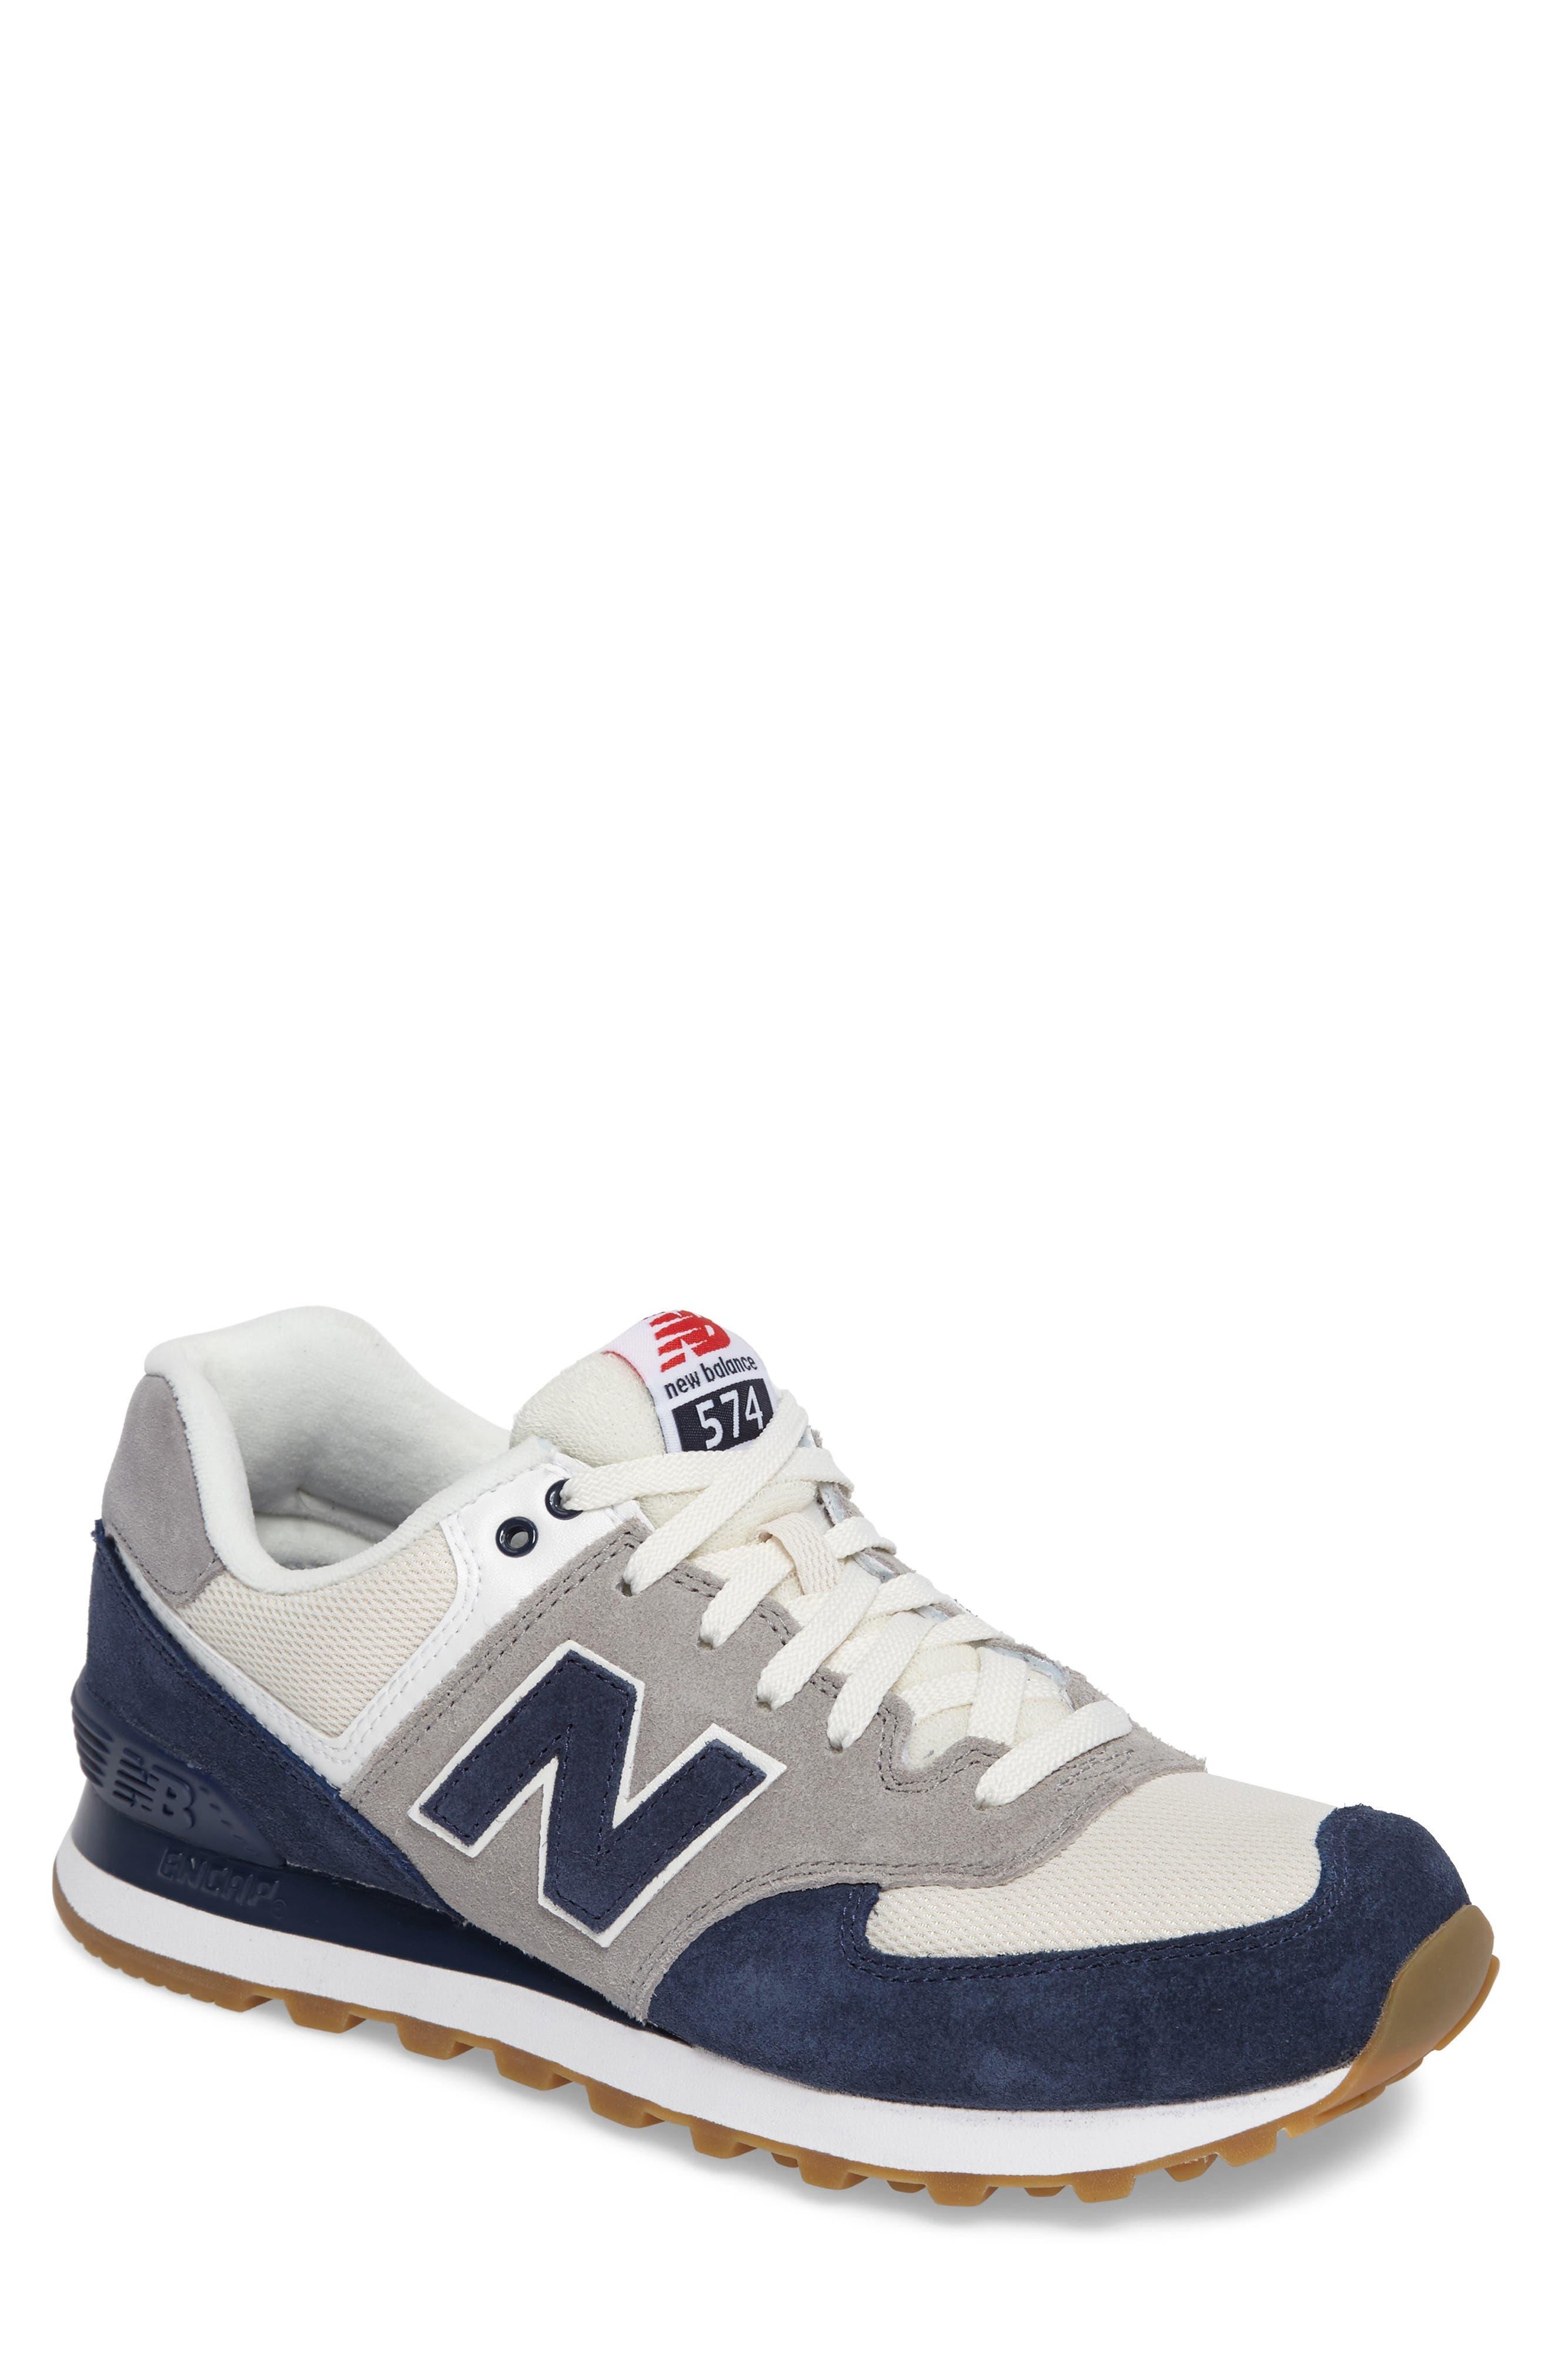 574 Retro Sport Sneaker,                             Main thumbnail 1, color,                             Electric Blue